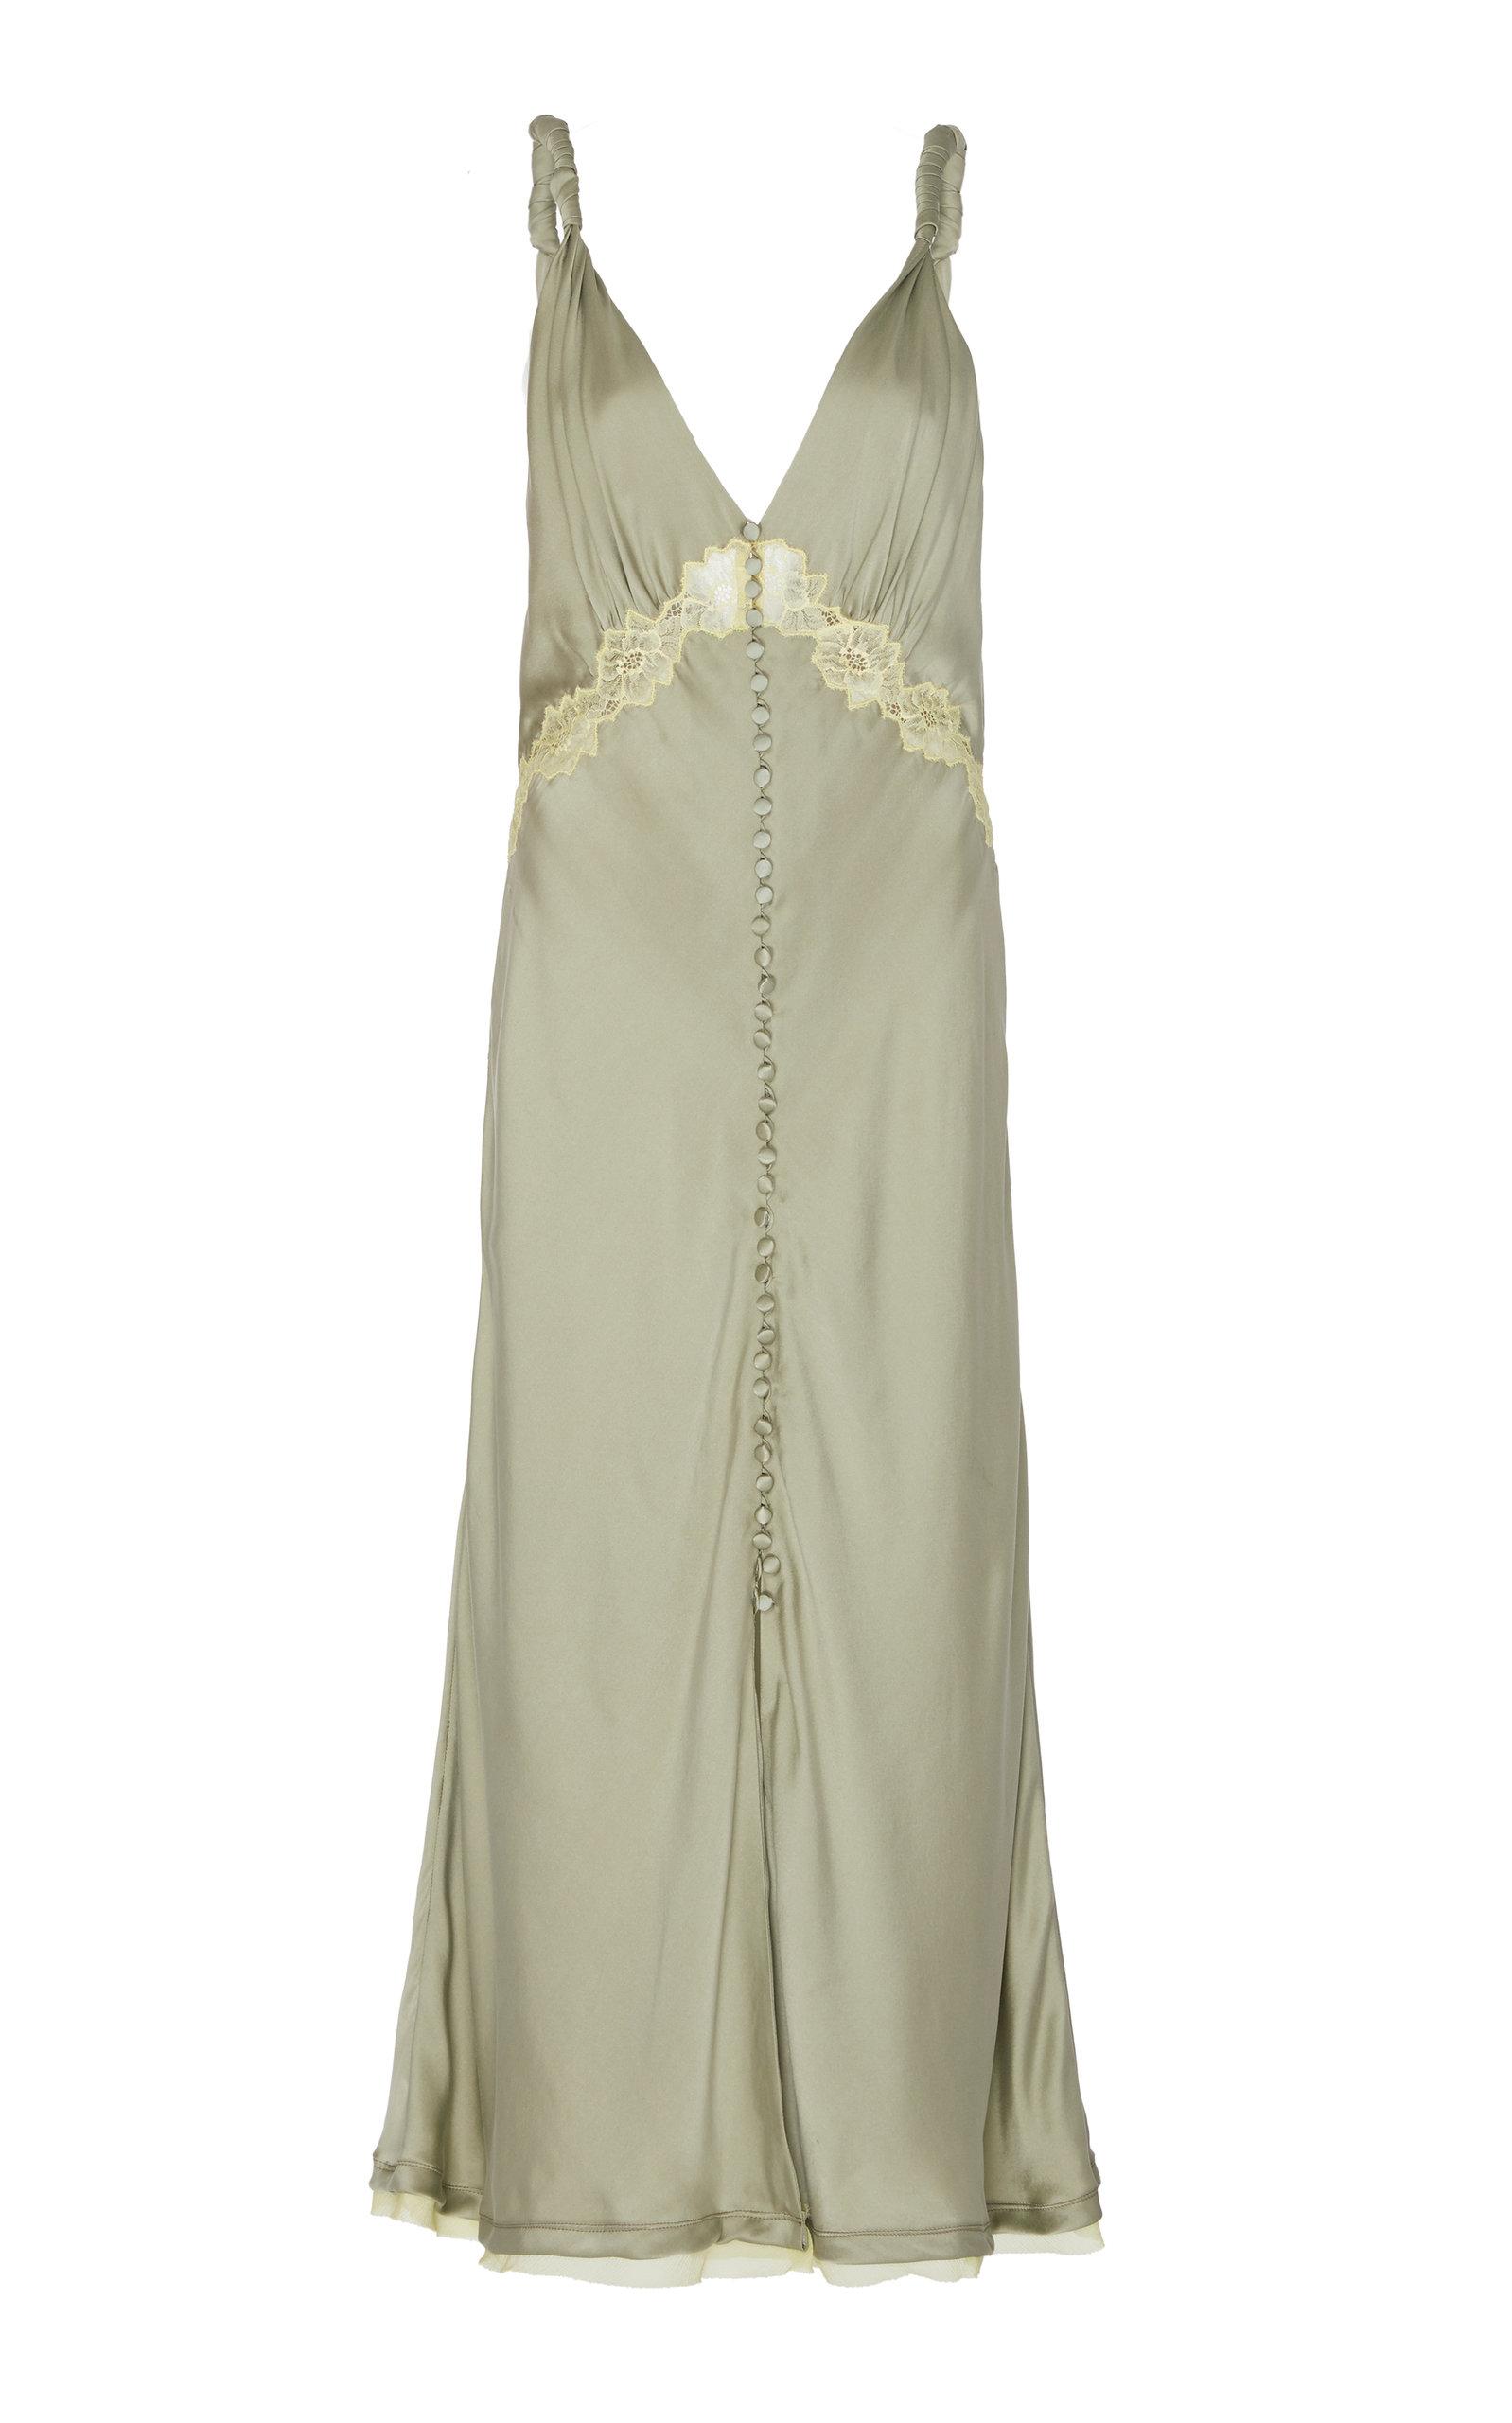 Buy Jonathan Simkhai Kendra Lace-Accented Silk Slip Dress online, shop Jonathan Simkhai at the best price